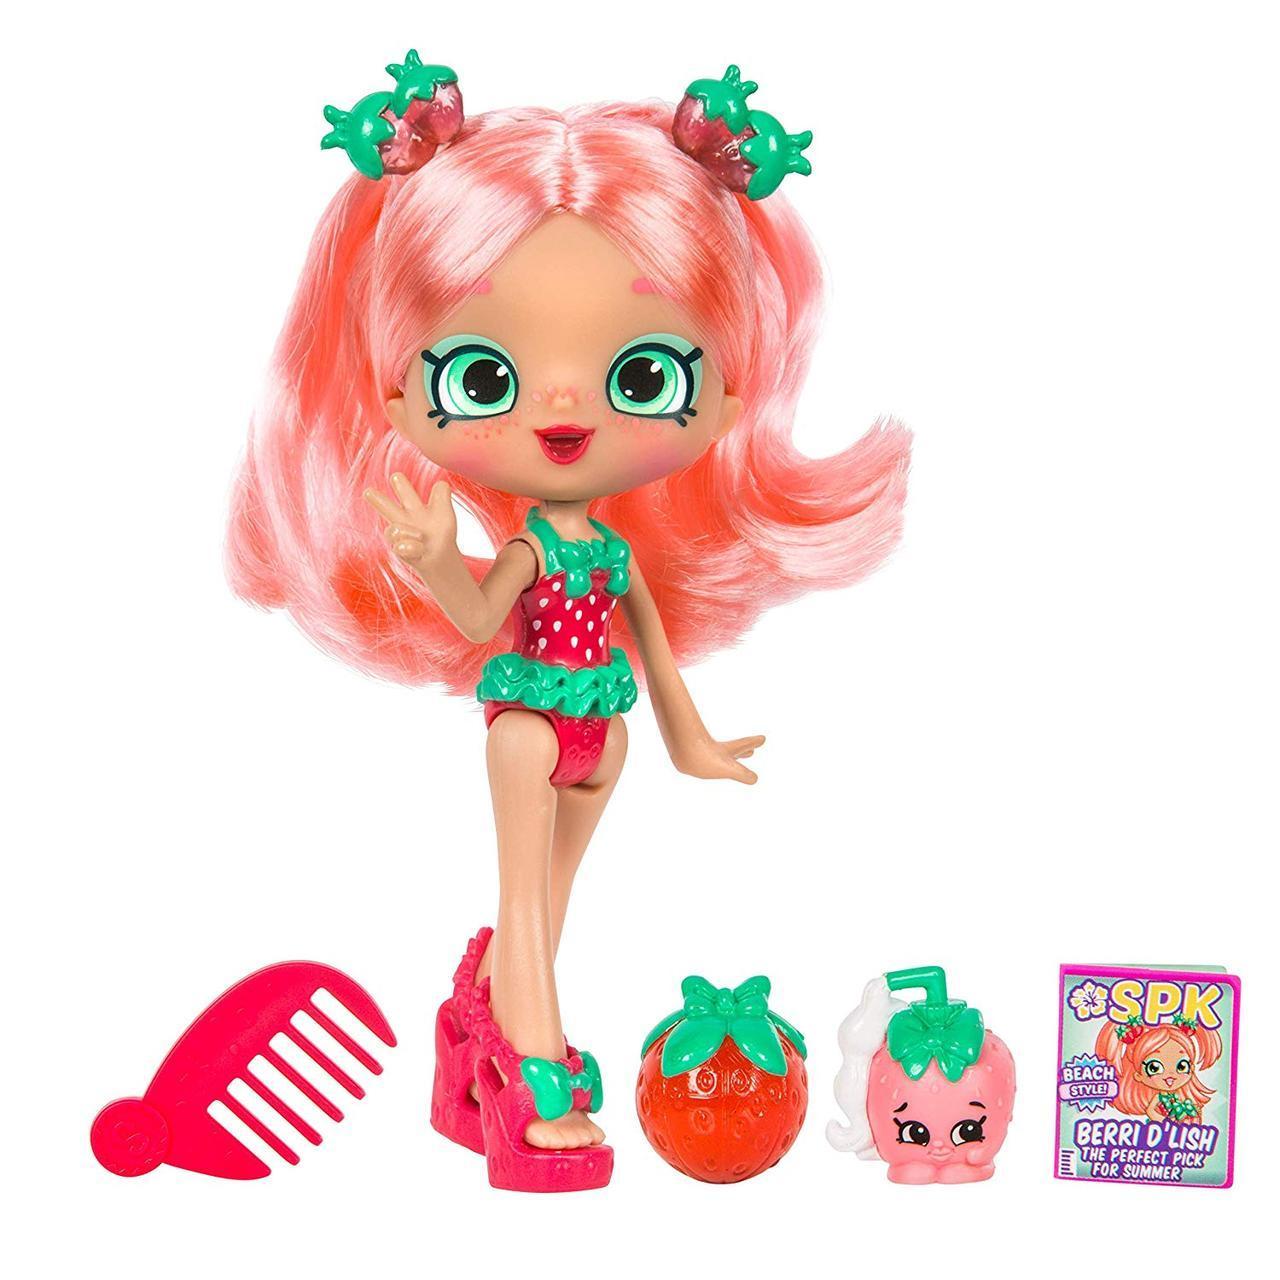 Кукла Шопкинс Клубничка Берри Пляжный сезон Shopkins Shoppies Beach Style - Berri D'lish оригинал